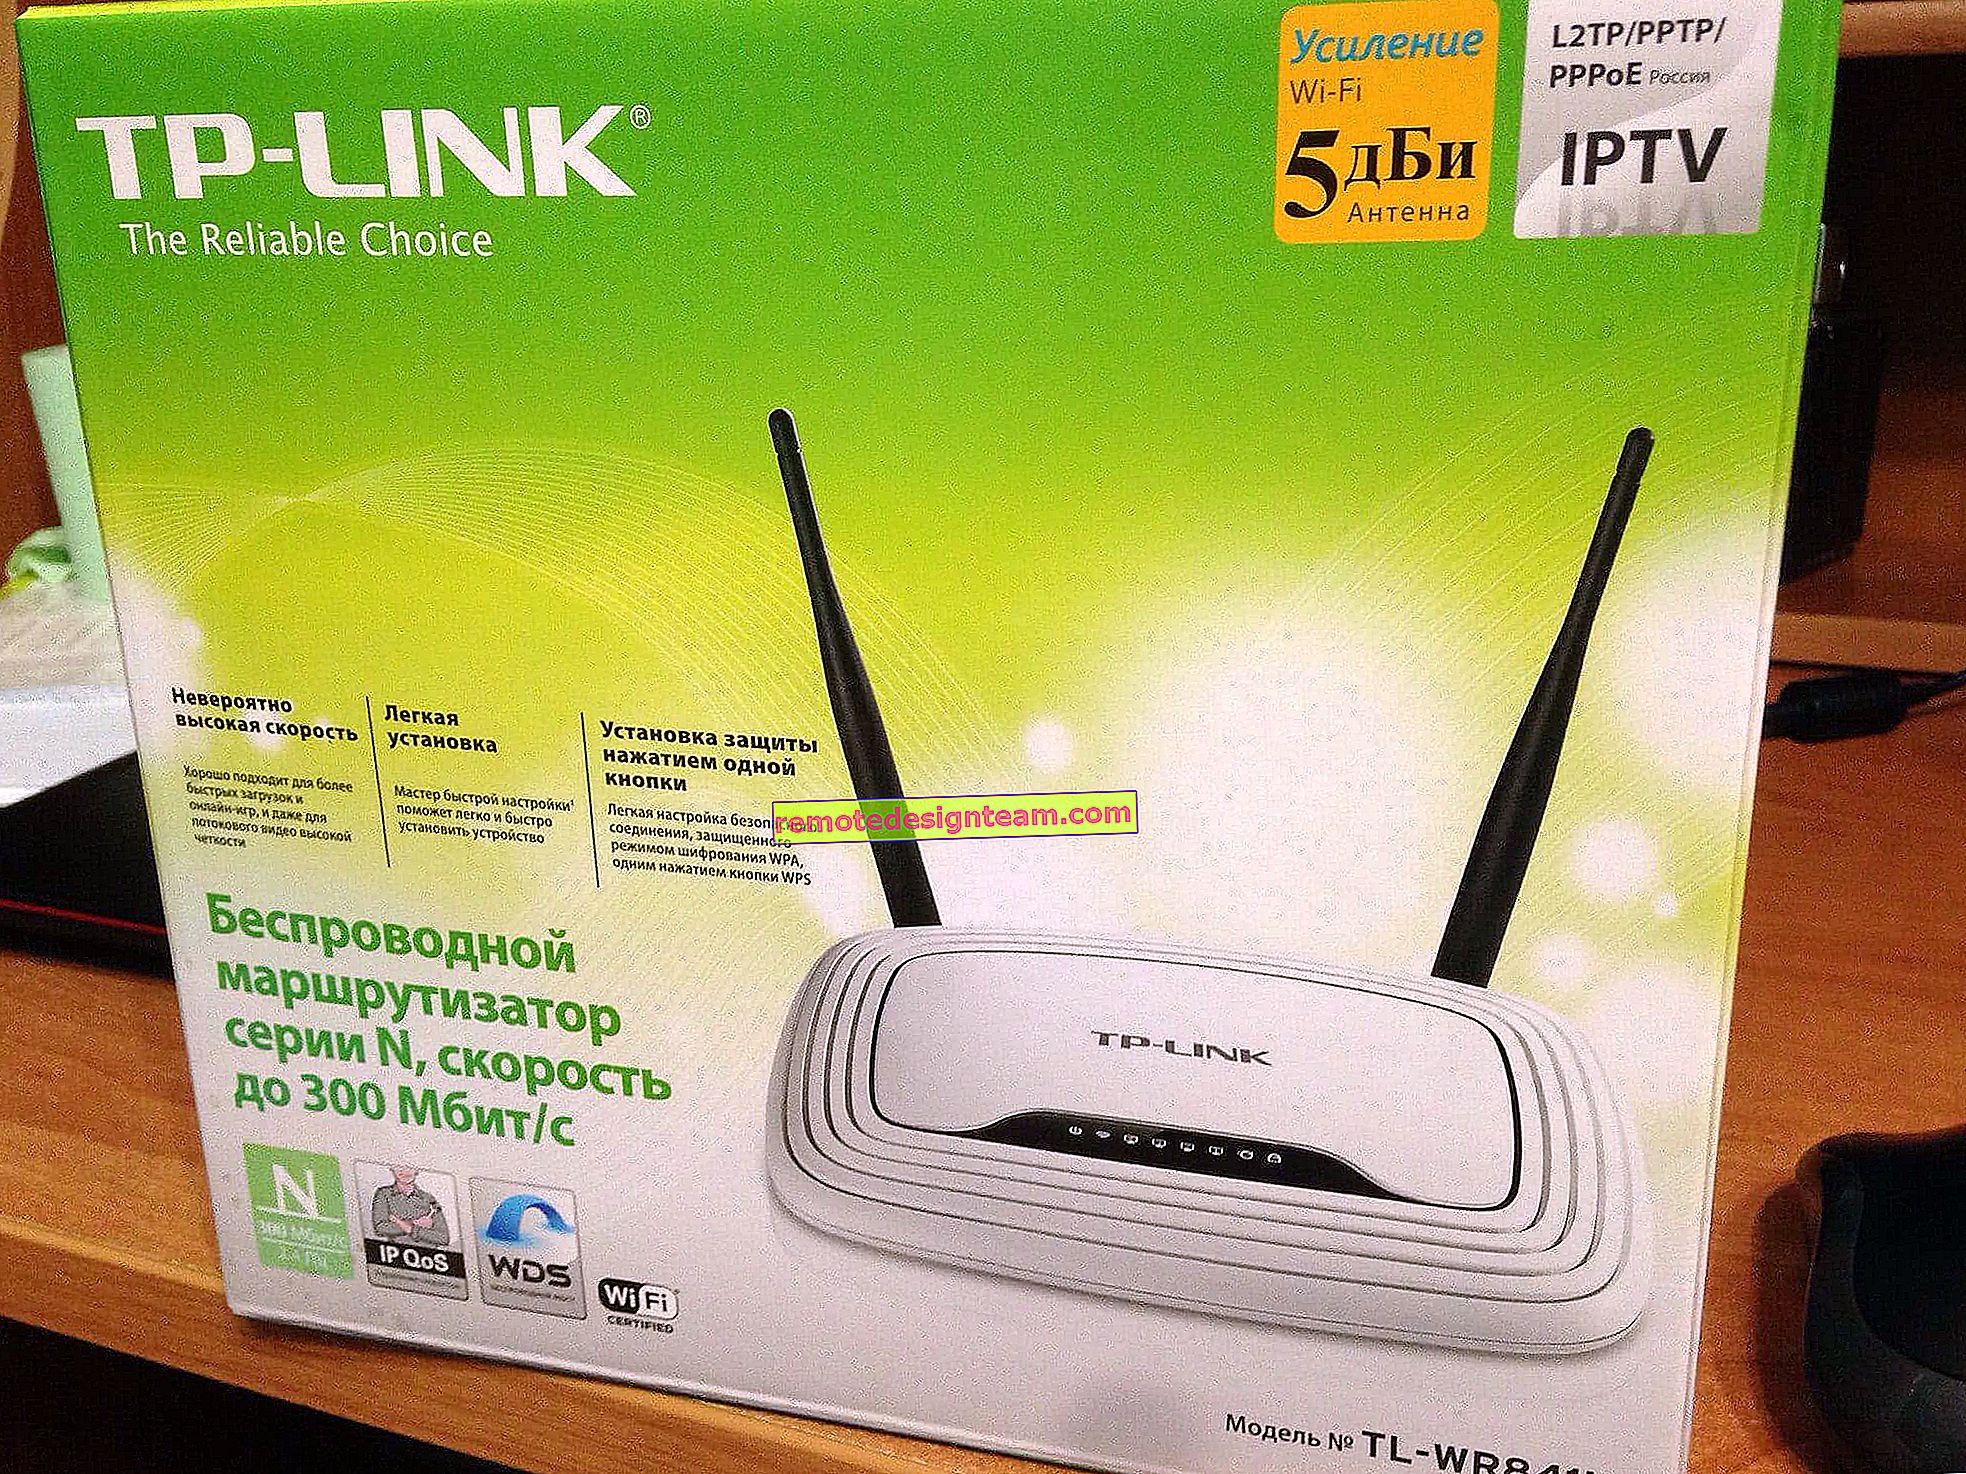 TP-Link TL-WR841Nルーターの構成。接続、インターネット、Wi-Fiの設定